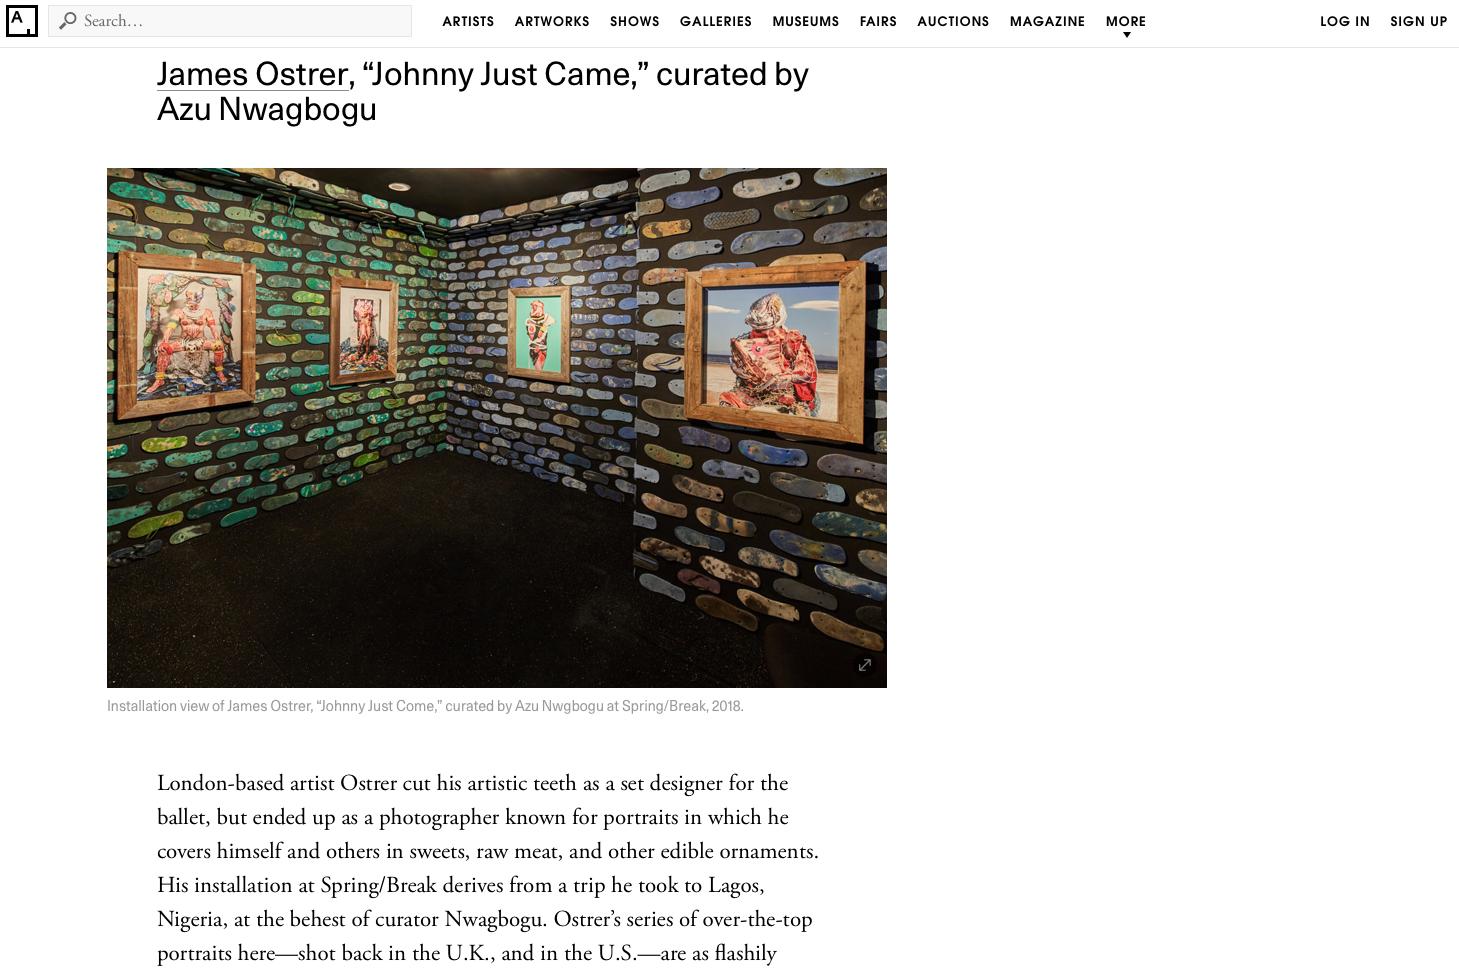 JAMES OSTRER   ARTSY   MARCH 2018